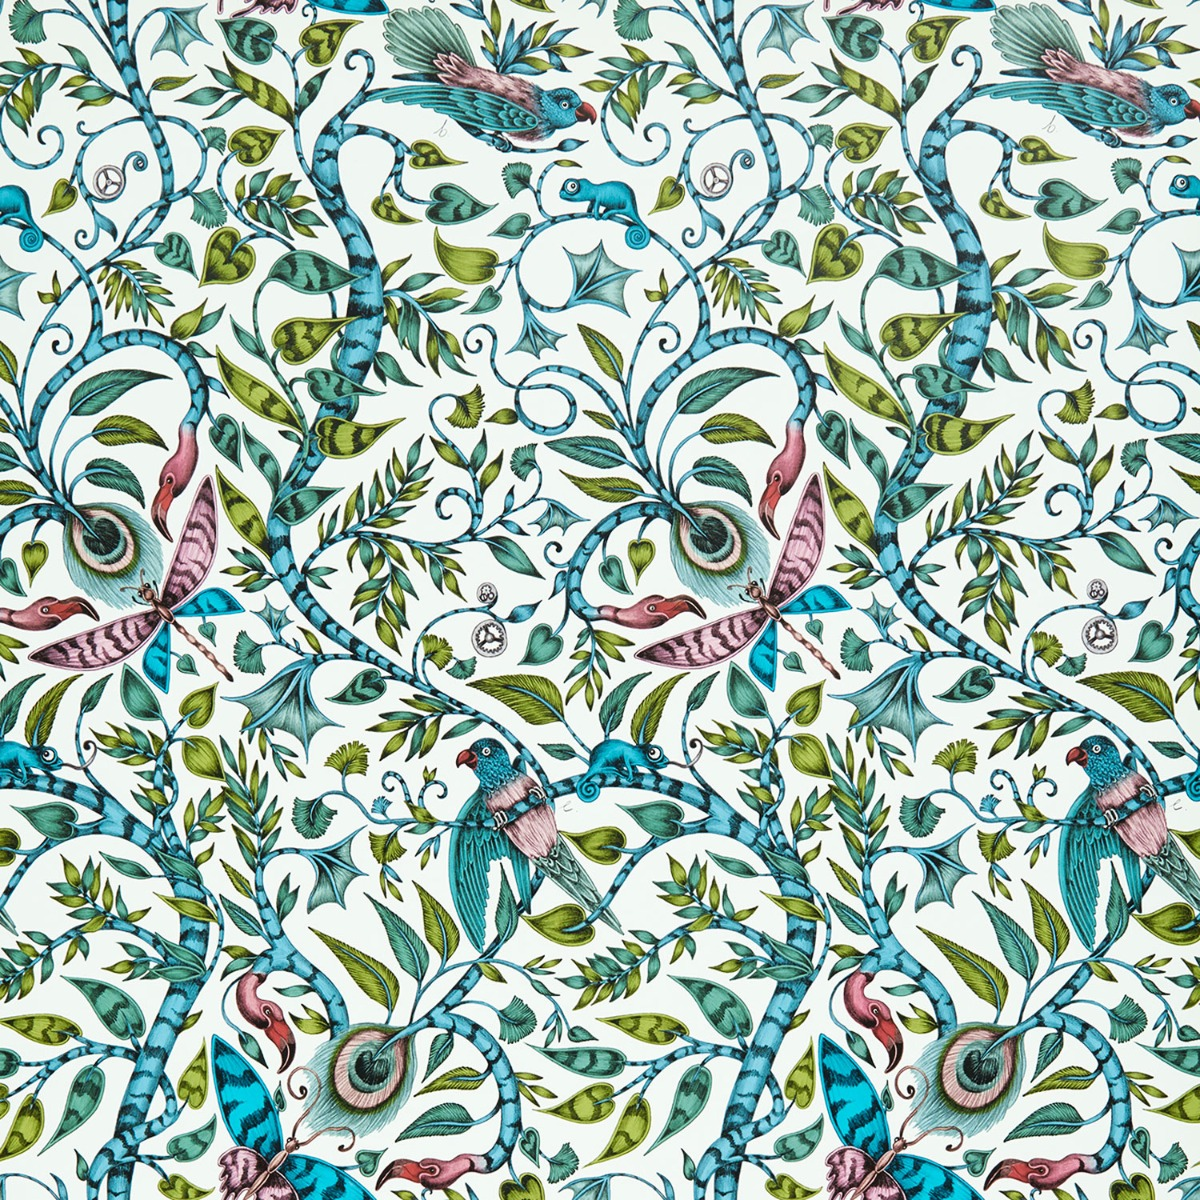 Emma J Shipley Animalia Rousseau Wallpaper Jungle W0104/03